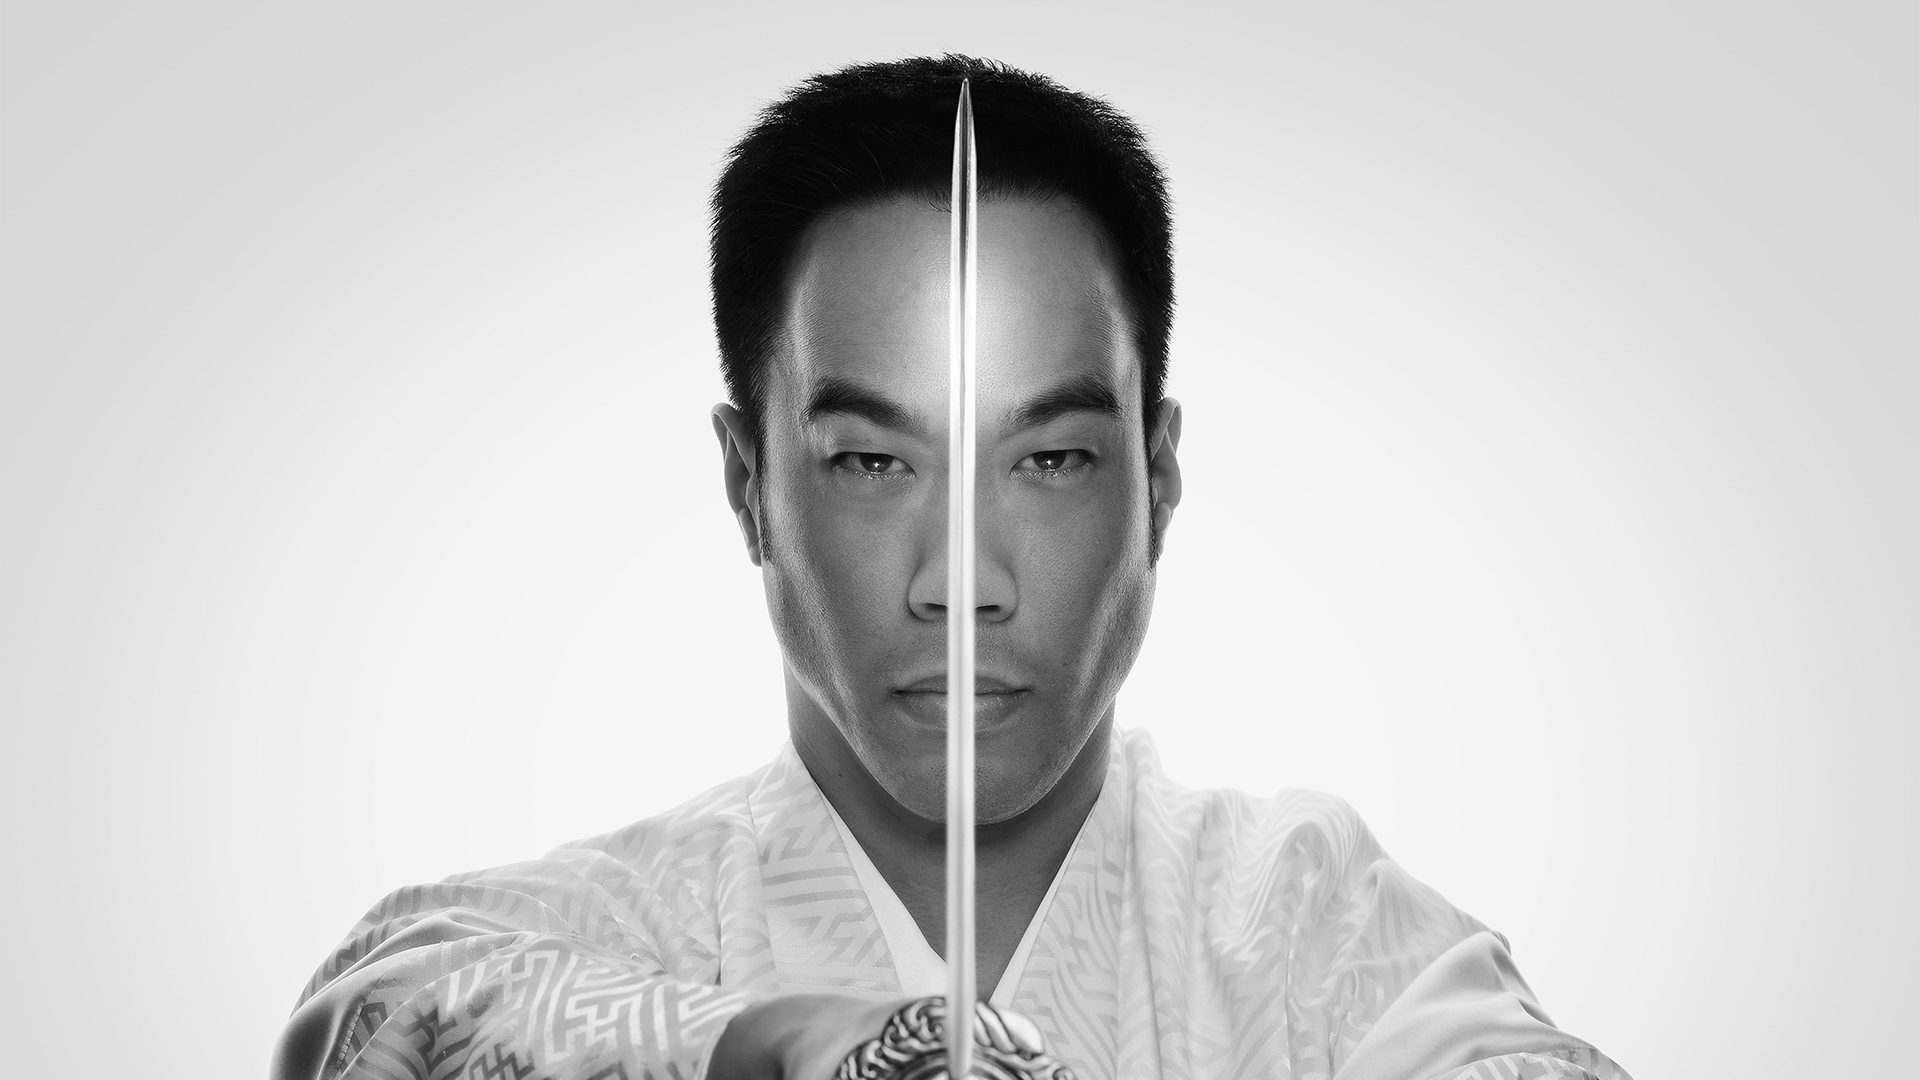 Ryan Hayashi with Samurai Sword